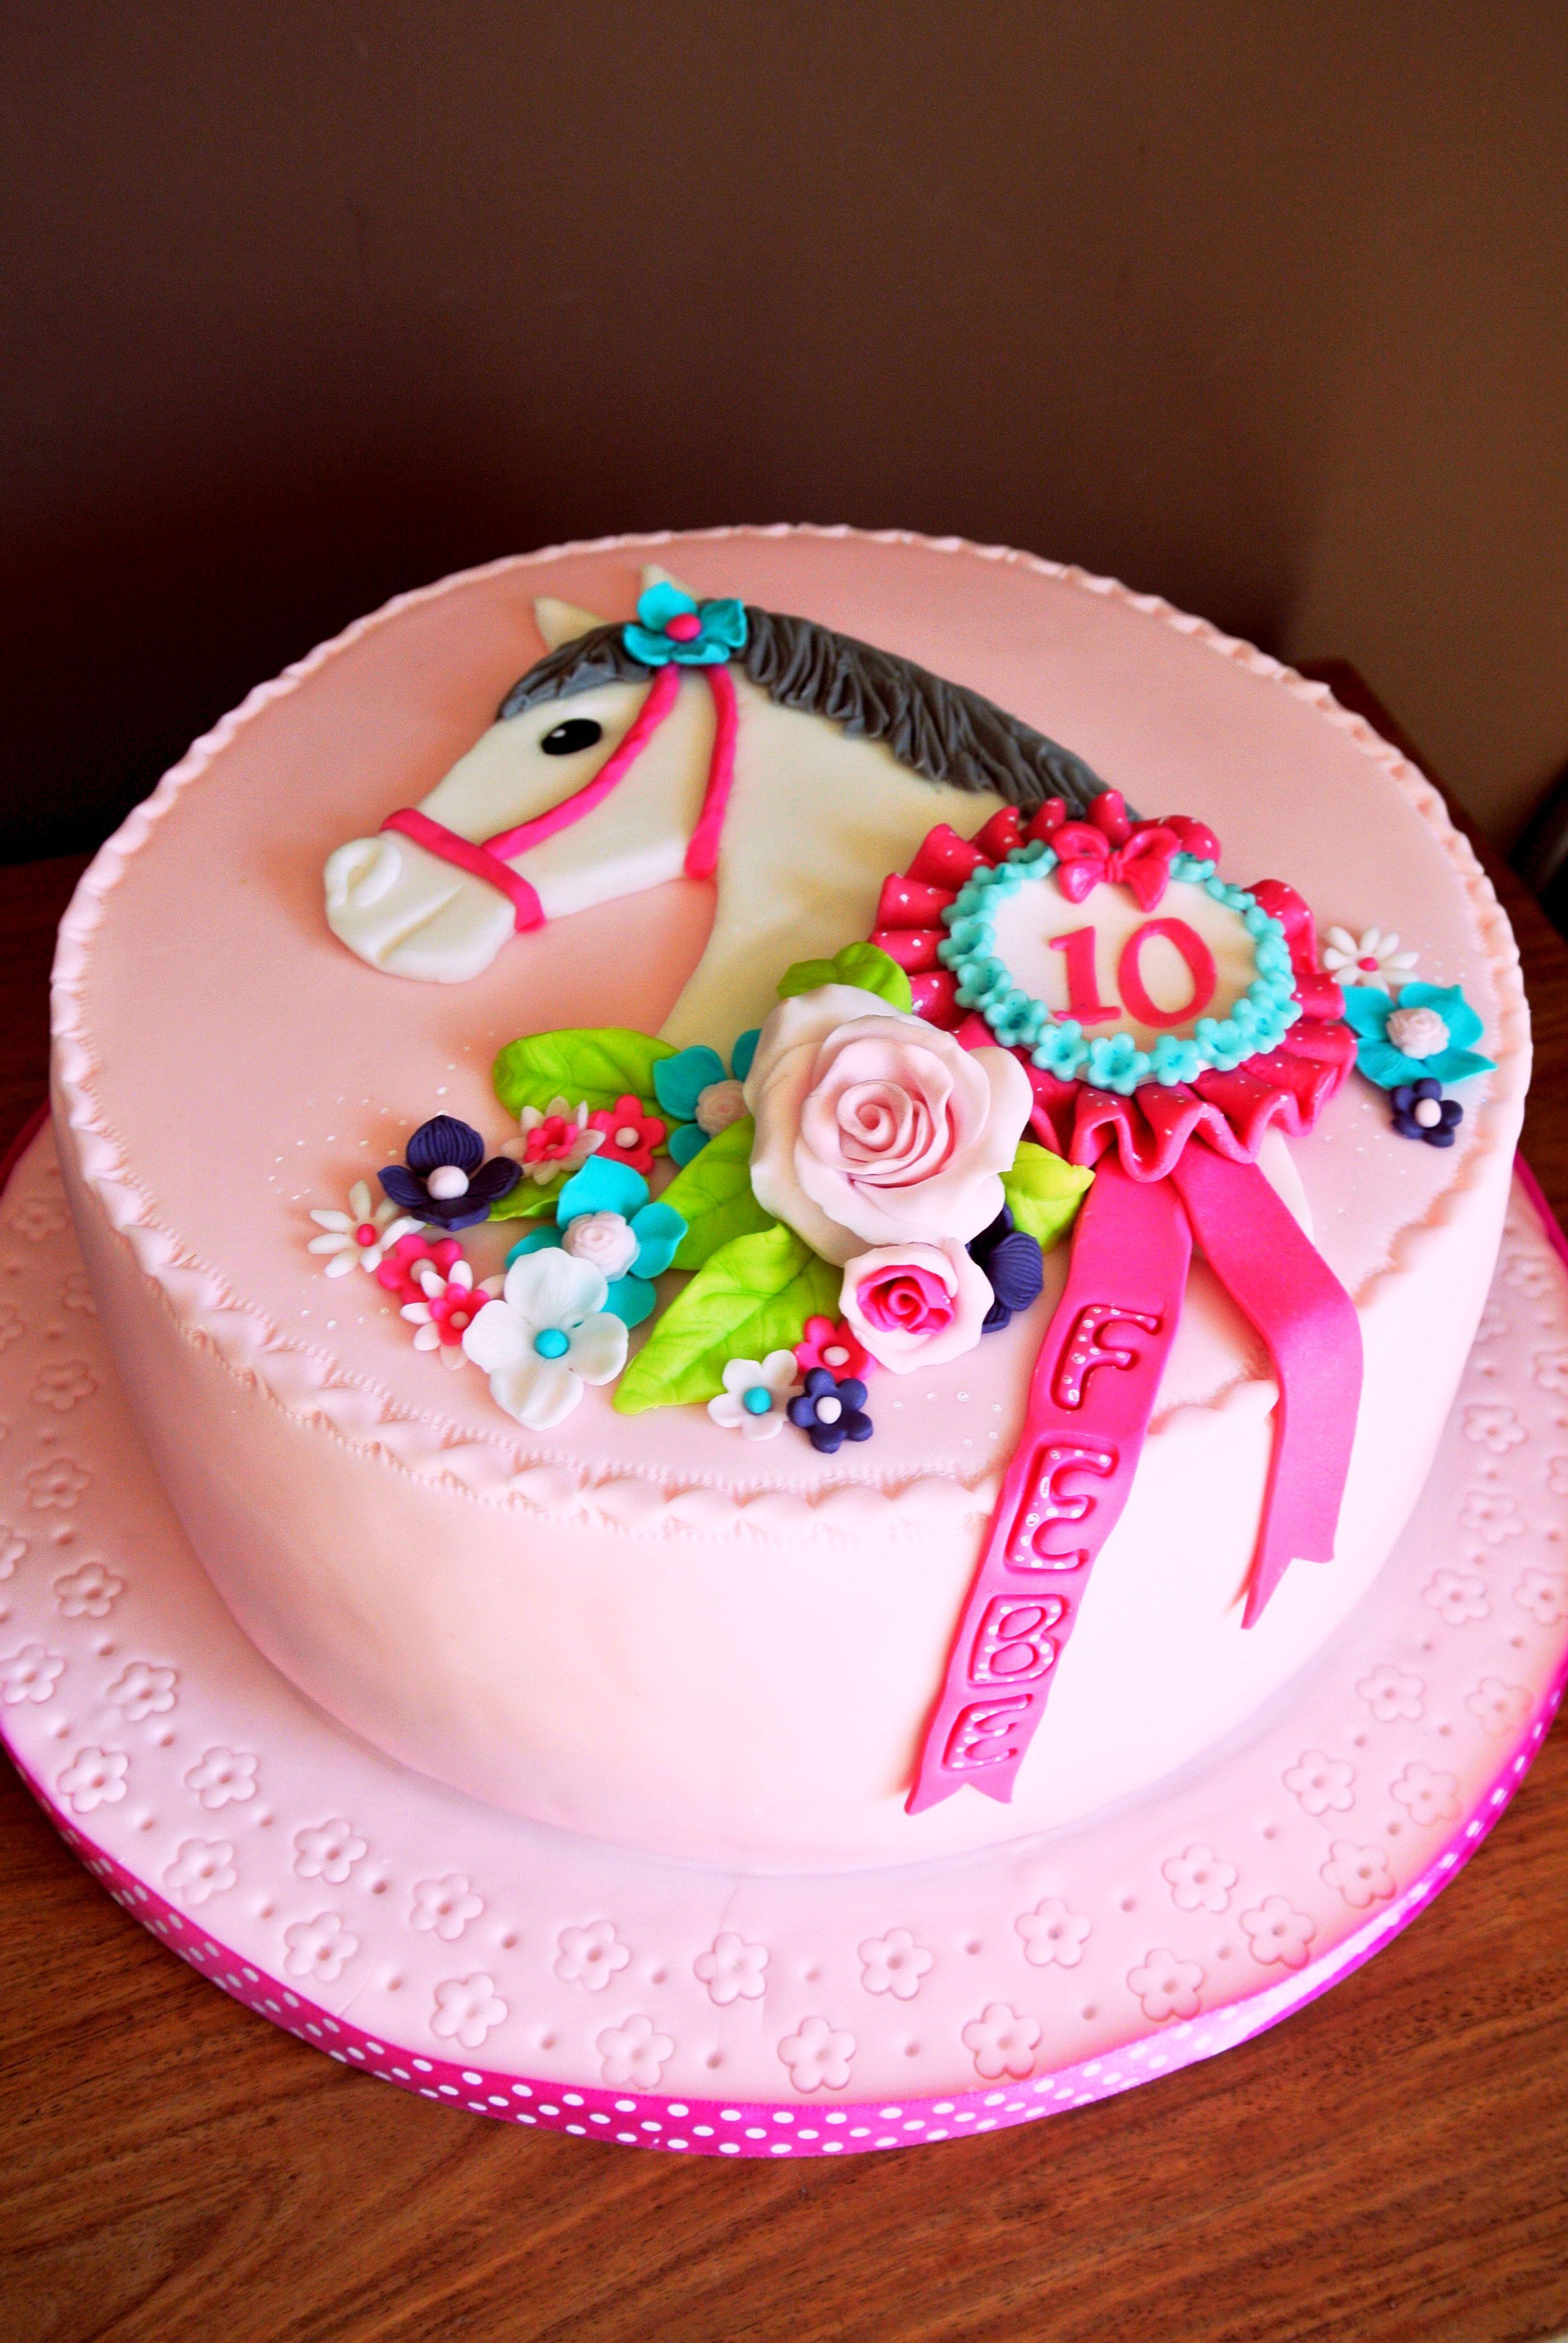 hourse cake party ideas Pinterest Cake Birthdays and Horse cake